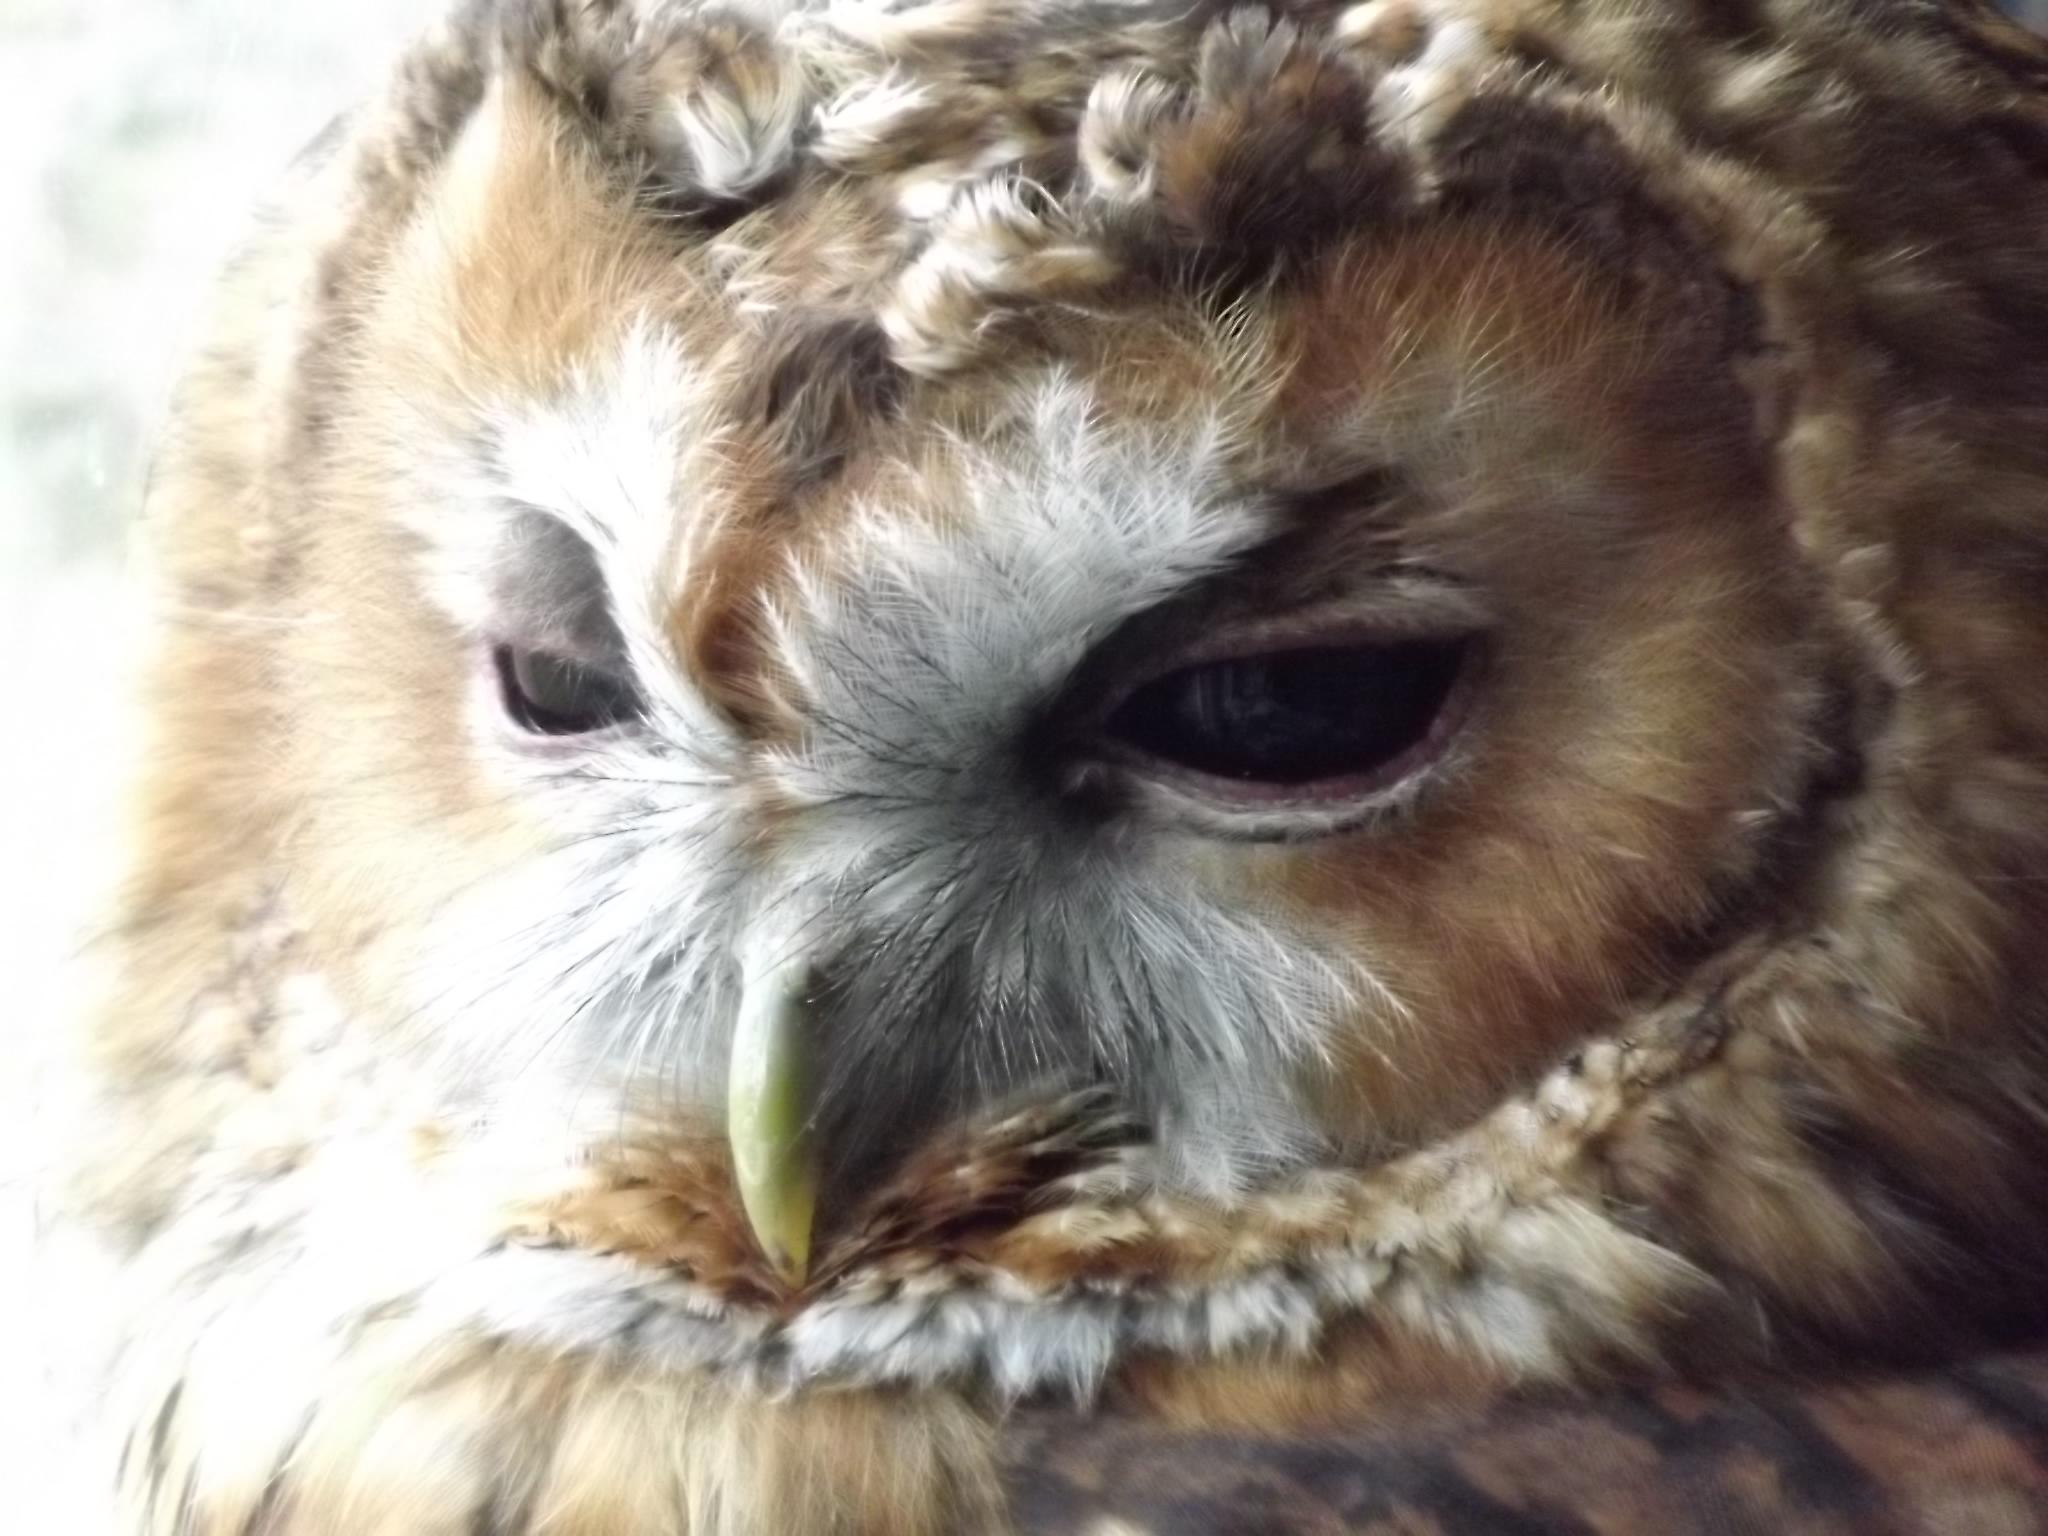 Visiting Barn Owl